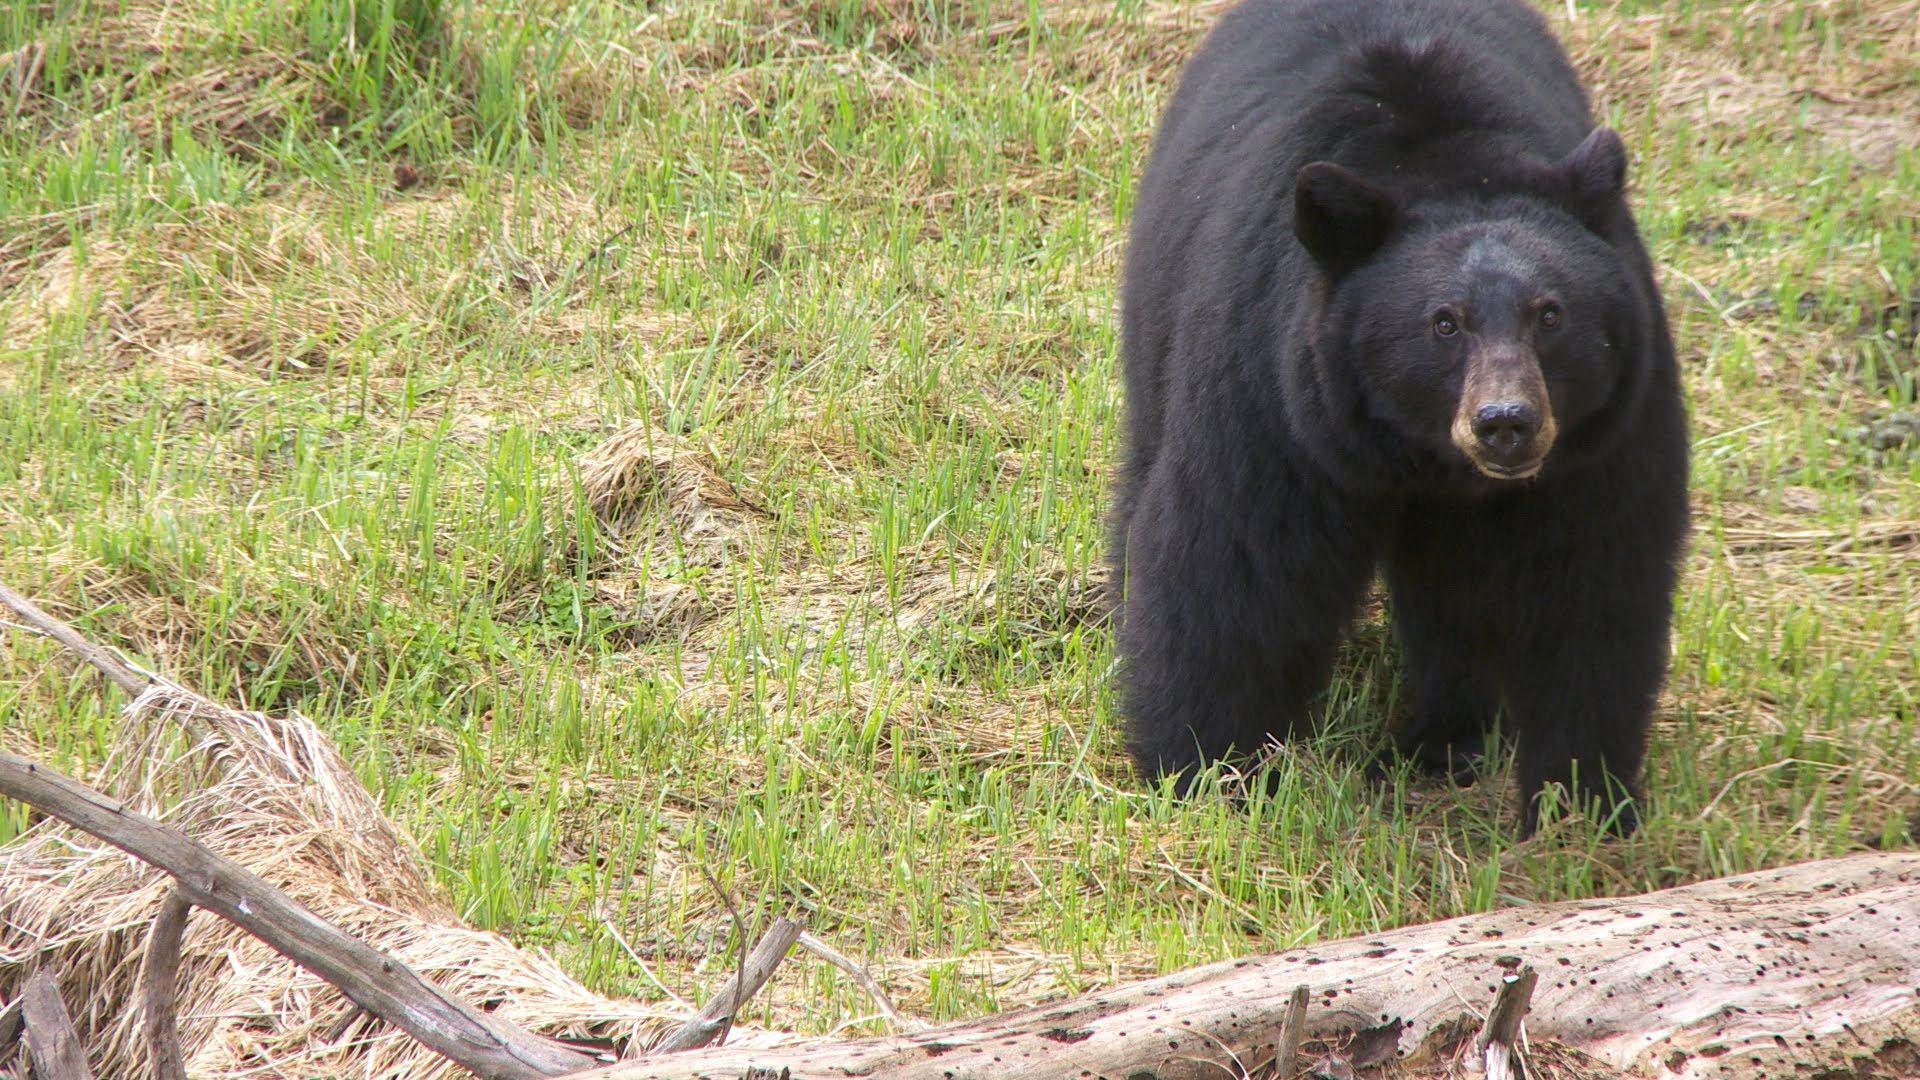 Black Bears Yosemite Nature Notes Episode 26 Black Bear Yosemite Bear